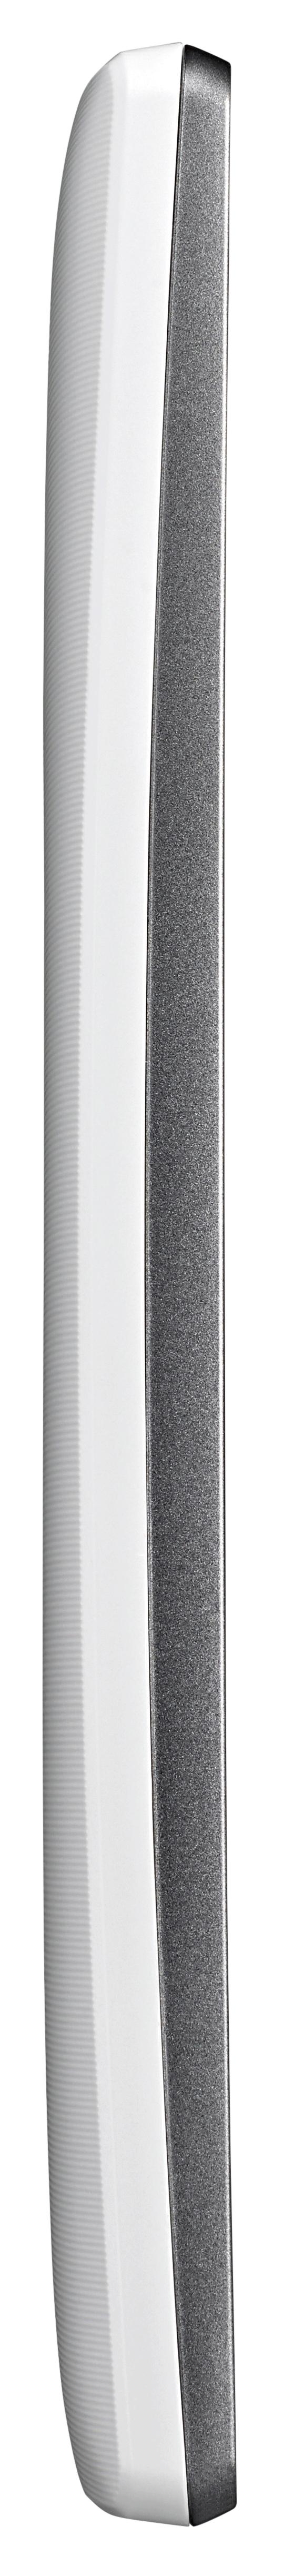 Мобильный телефон LG Spirit Y70 H422 White - 2